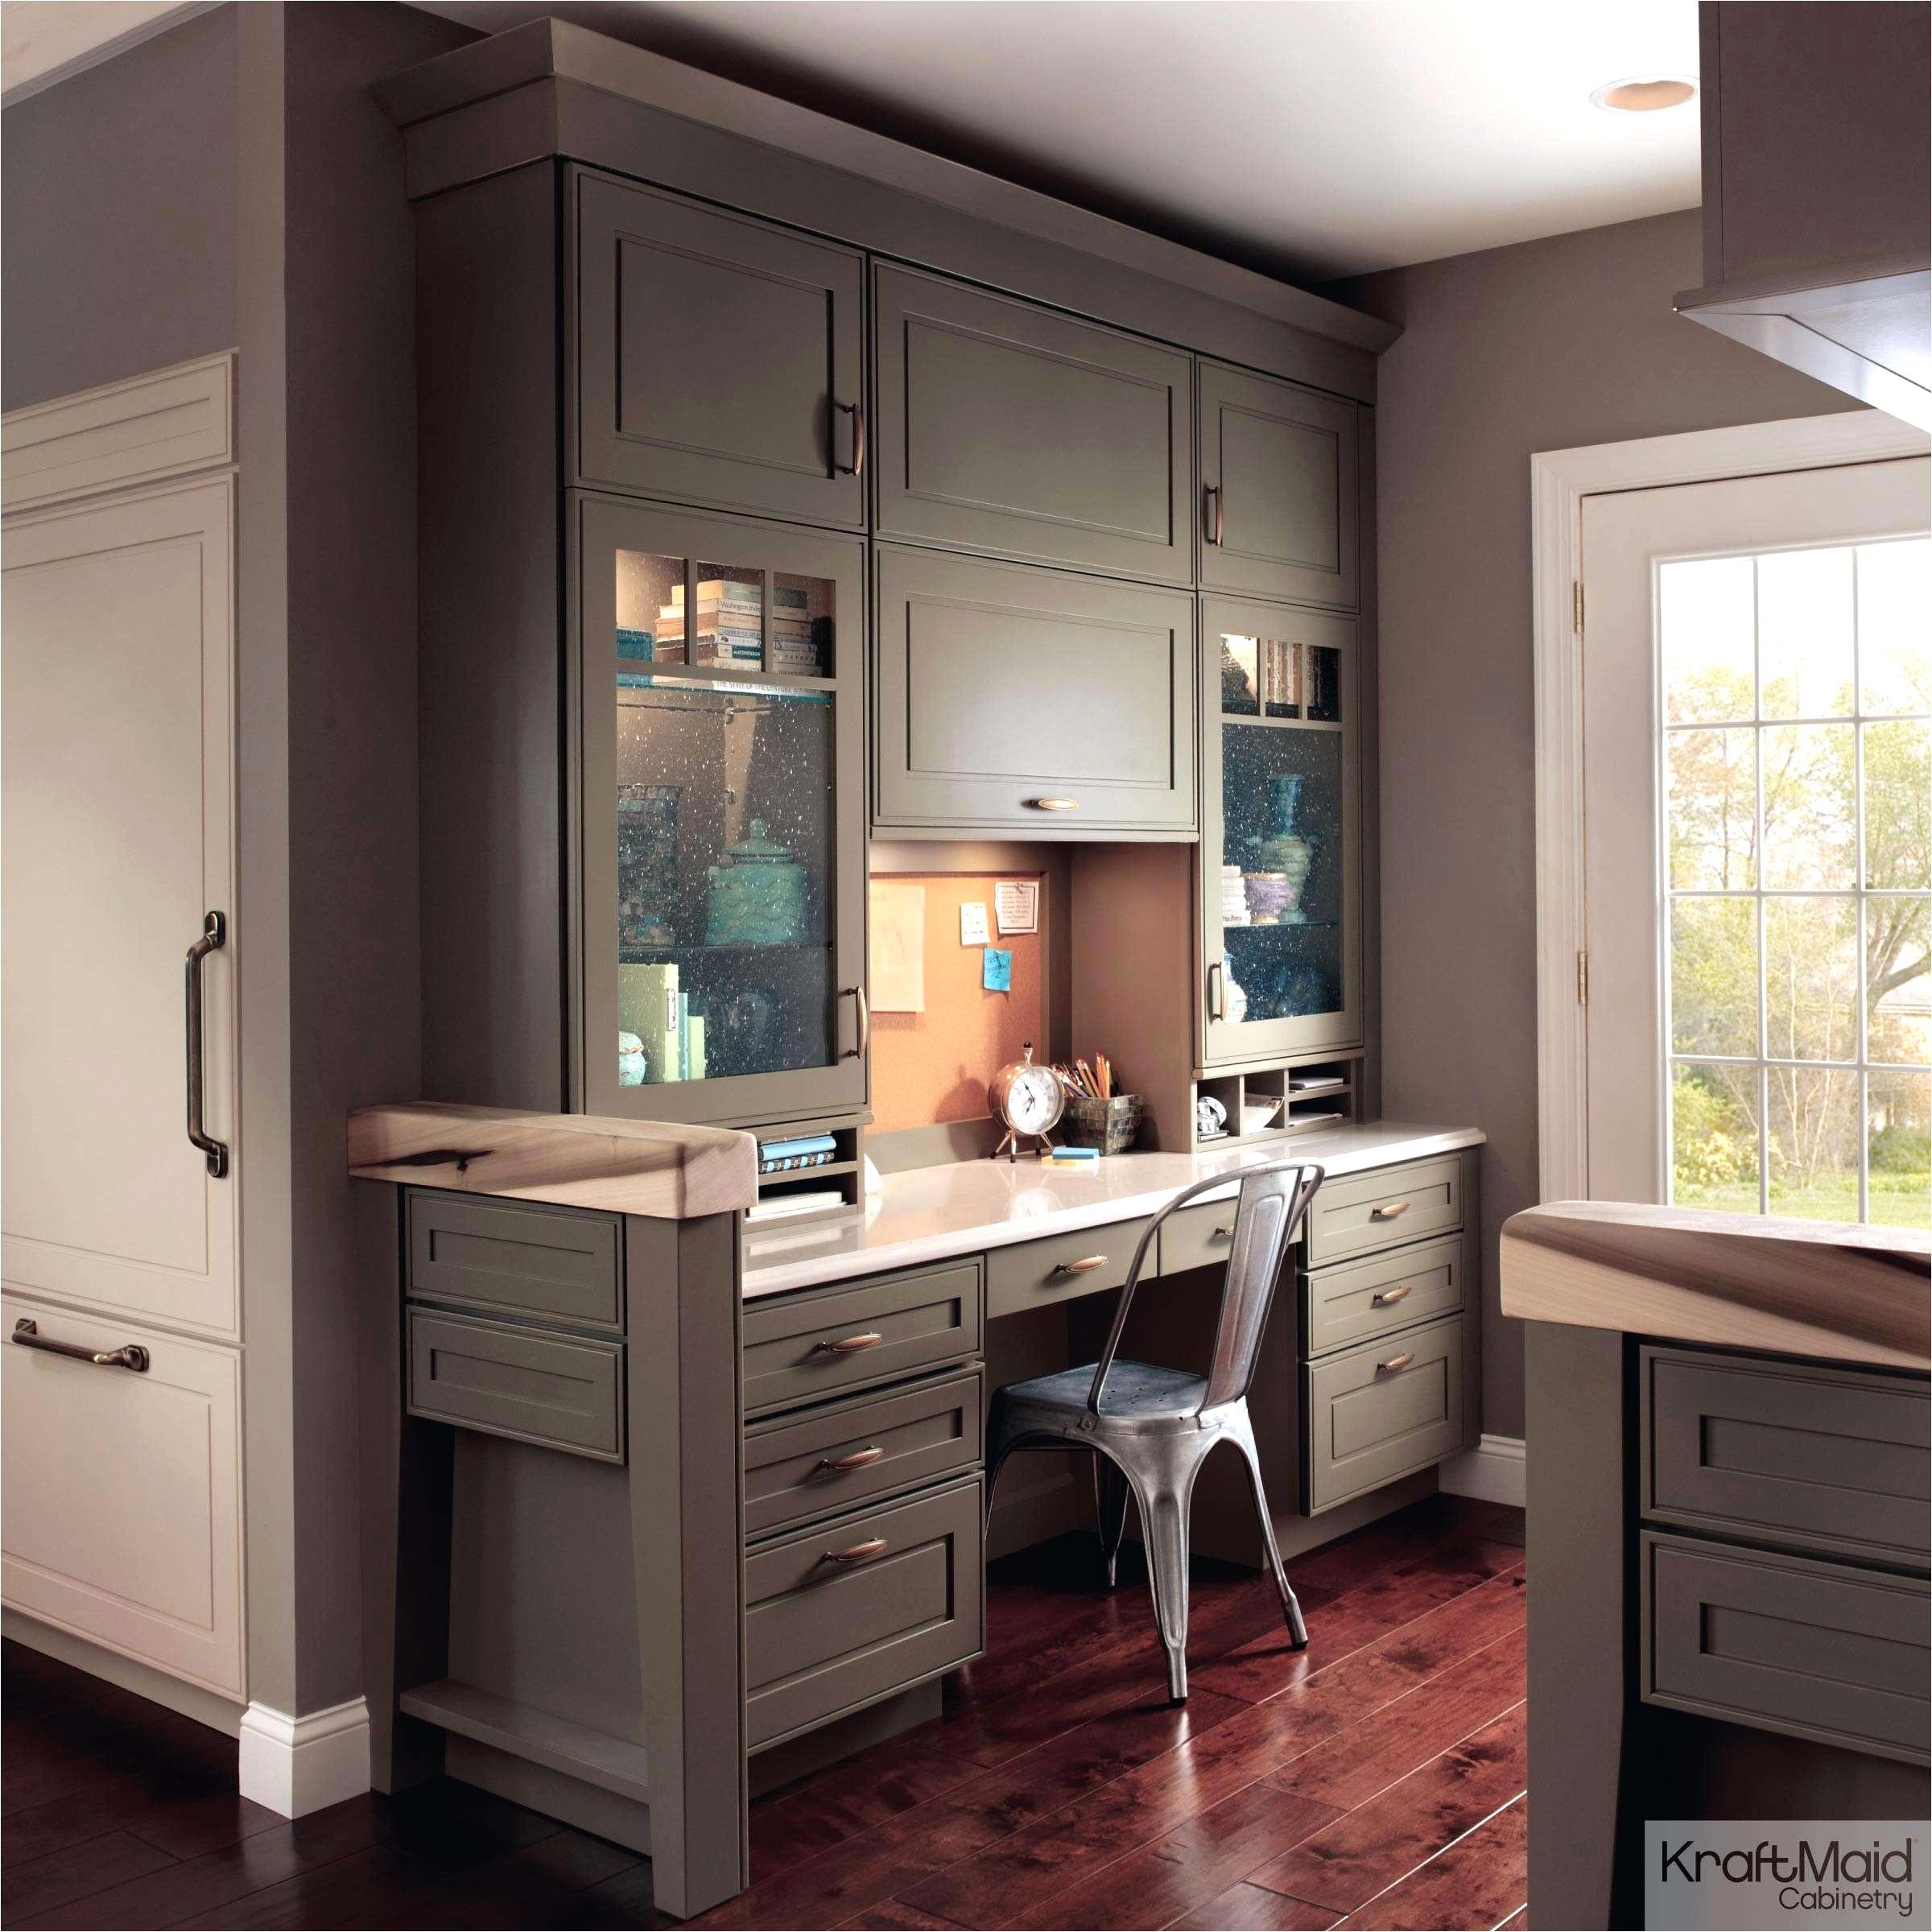 custom kitchen cabinets lovely kitchen cabinet 0d design ideas custom kitchen designs 32 best rustic pantry 50 beautiful single panel interior door